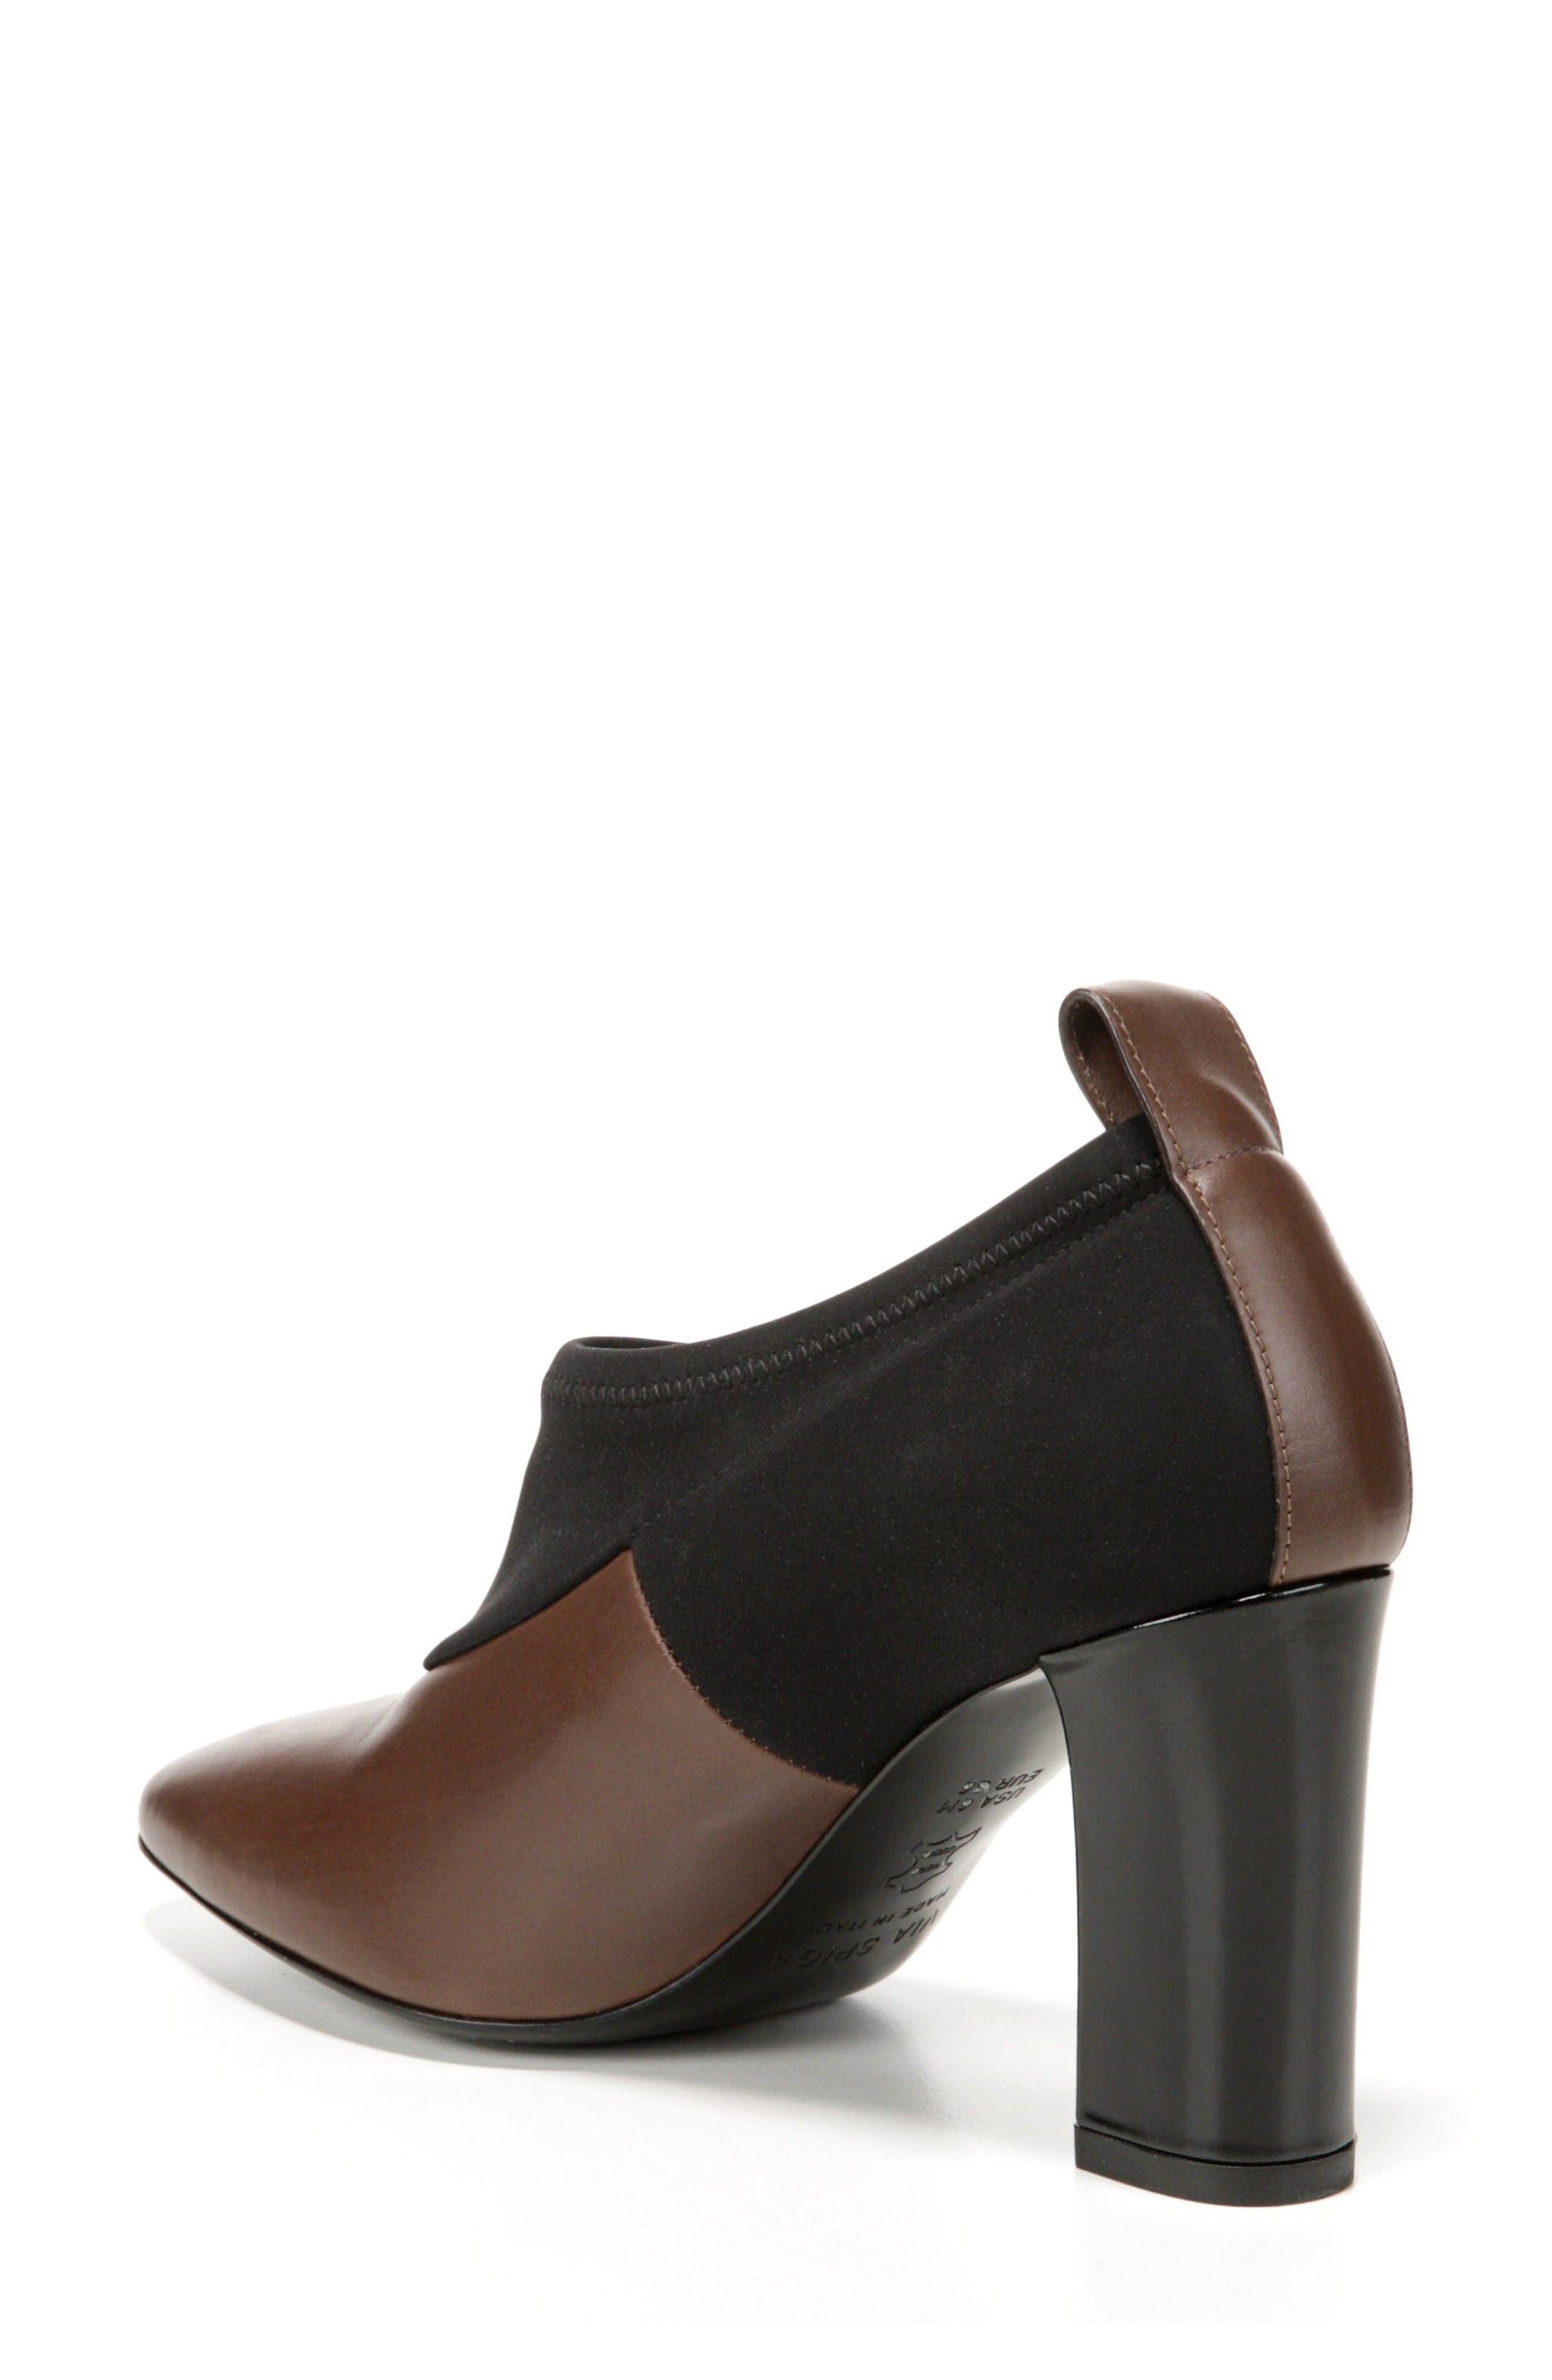 VIA SPIGA, Bayne Block Heel Bootie, Alternate thumbnail 2, color, 250